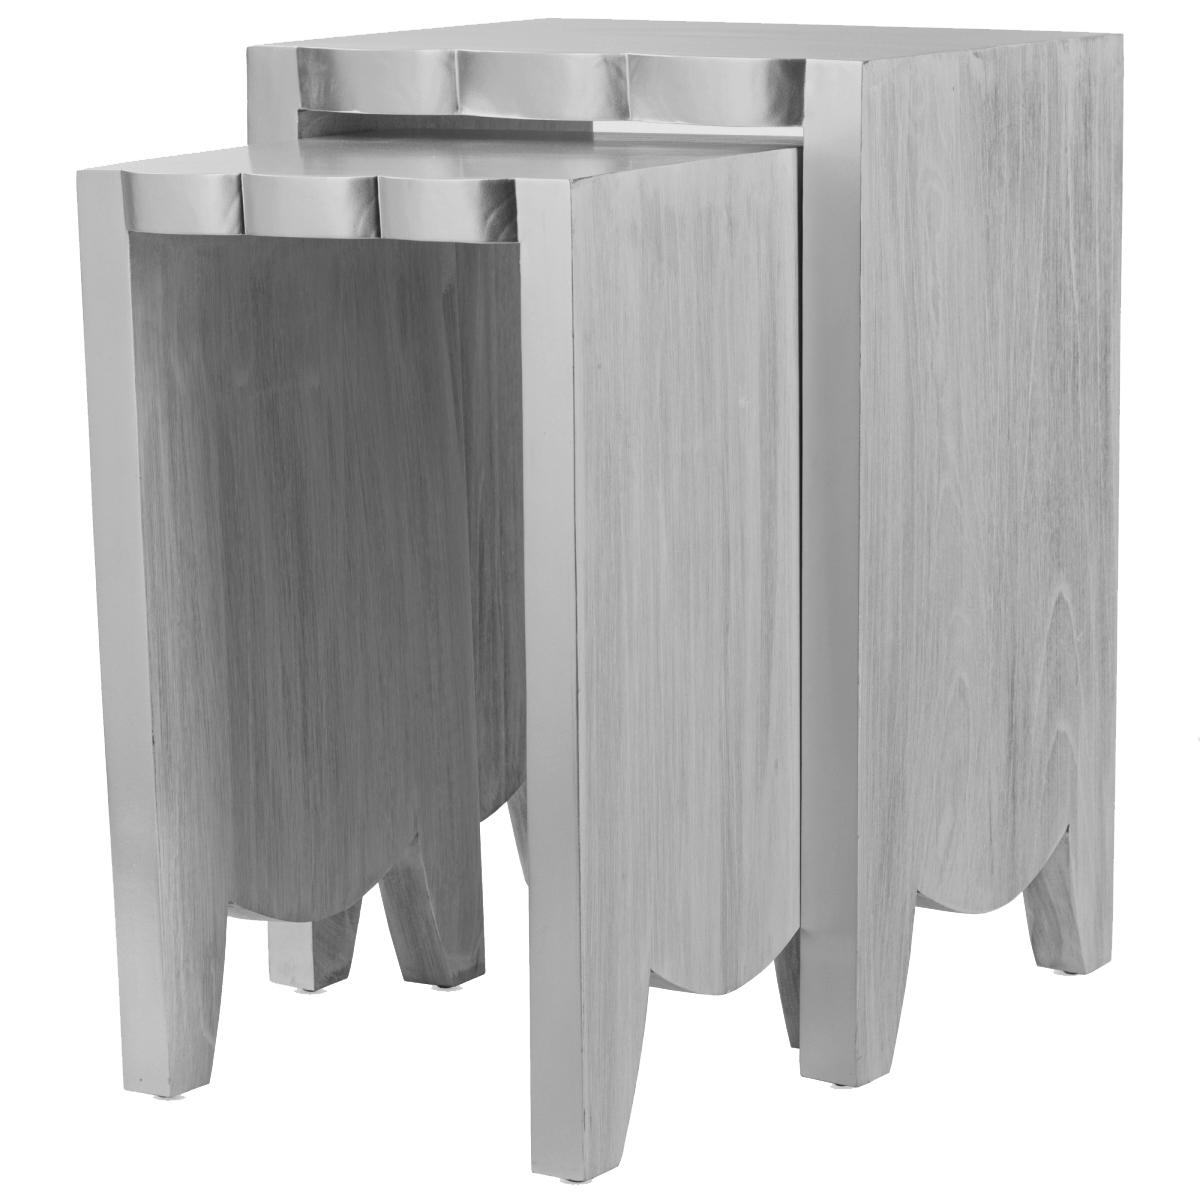 Комплект столиков UTTERMOST IMALA NATURAL ASH NESTING TABLE SET OF 2  - фото 1